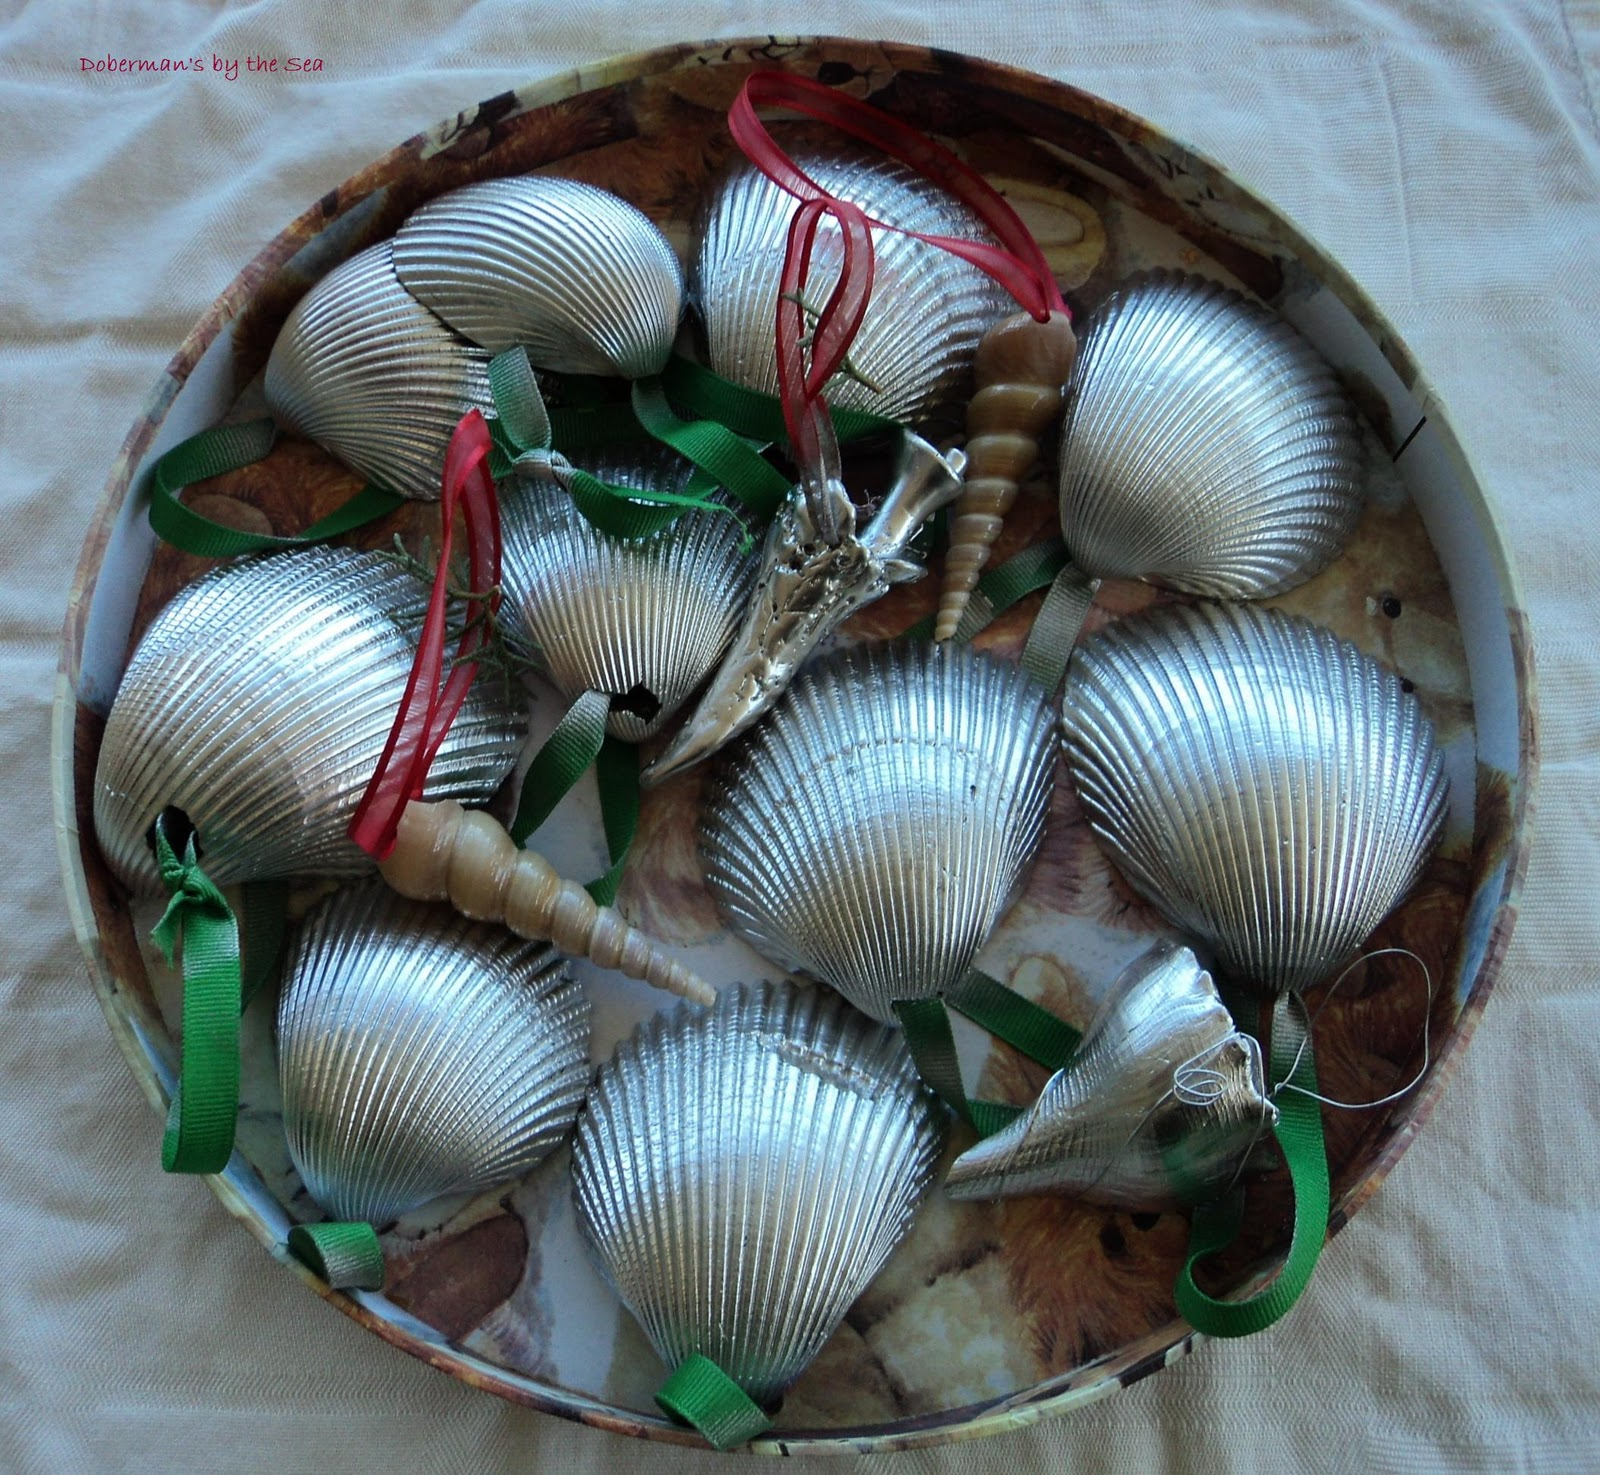 Doberman s by the sea diy shell garland ornaments